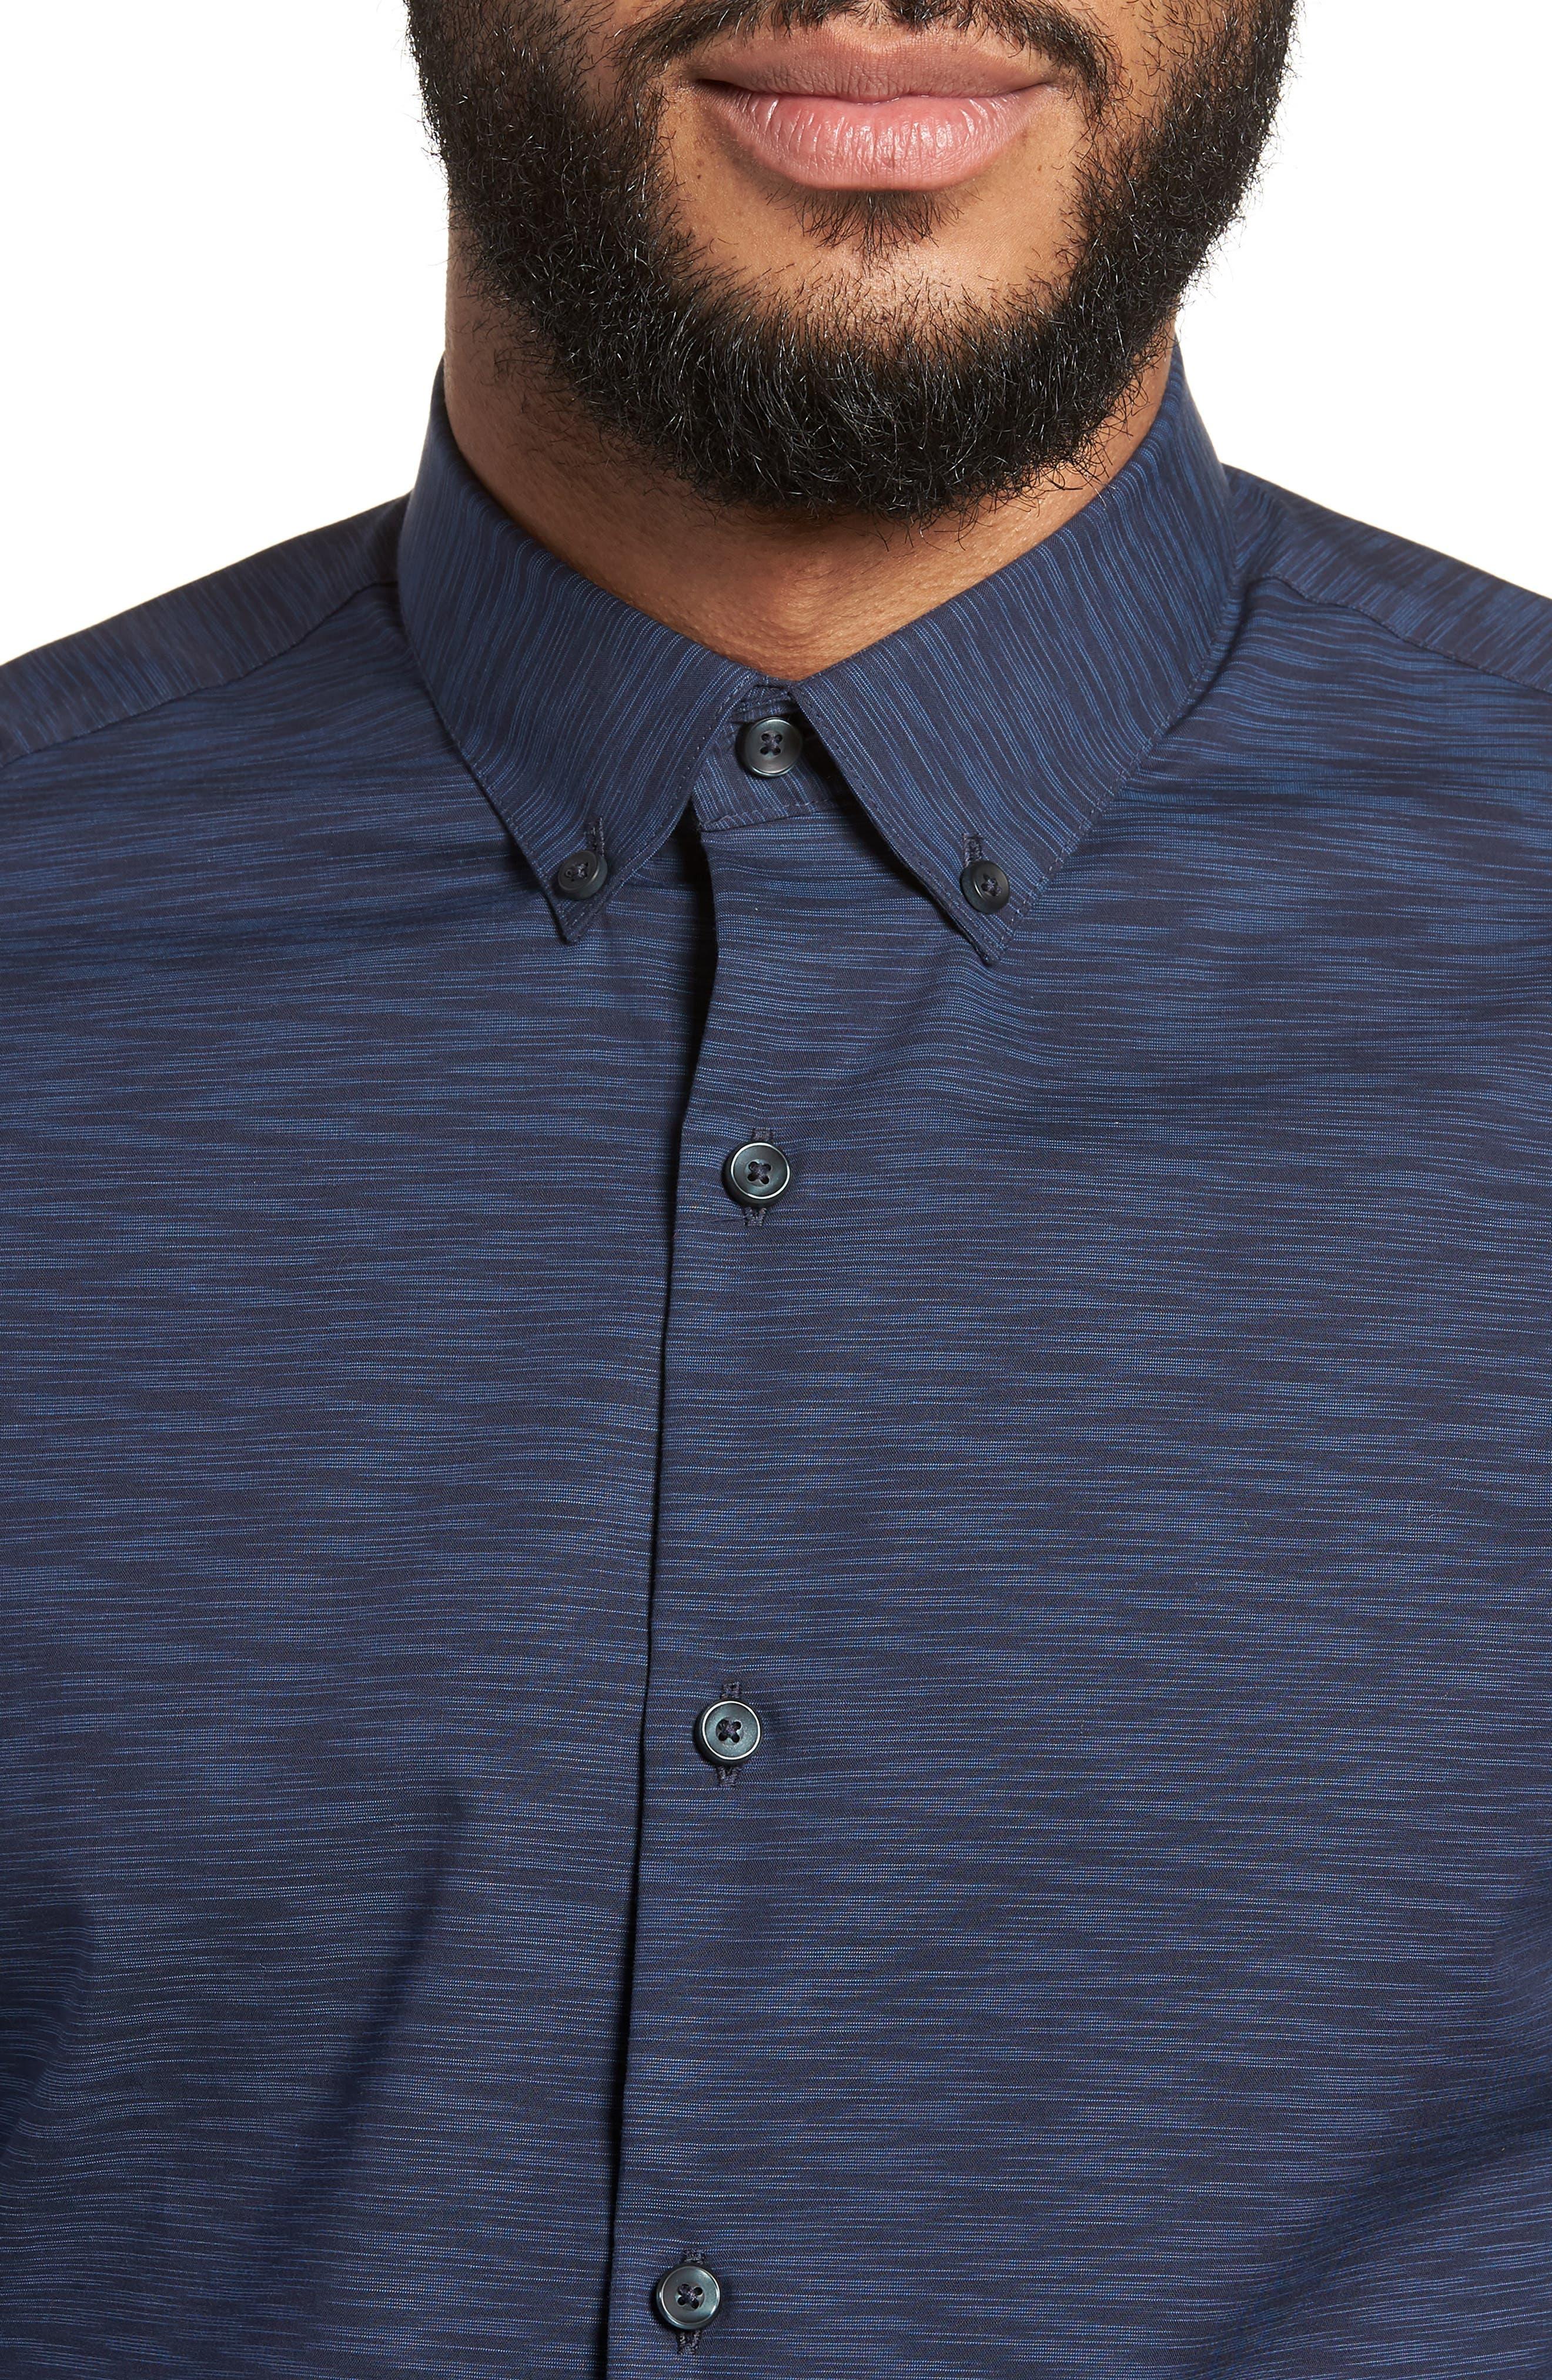 Trim Fit Solid Sport Shirt,                             Alternate thumbnail 4, color,                             Navy Blue Space Dye